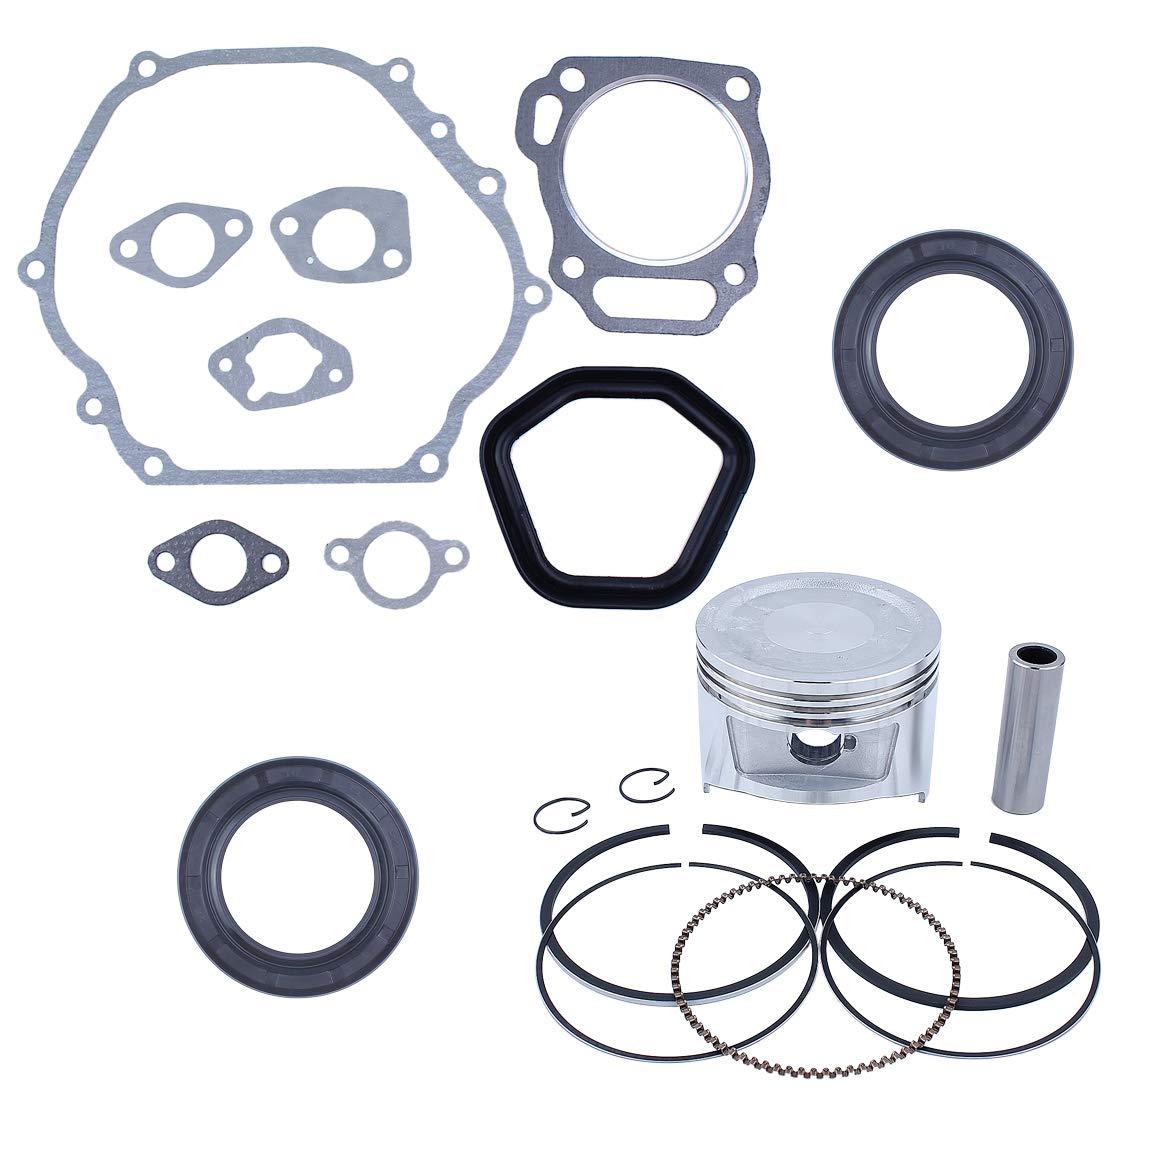 88mm Piston Rings Crankshaft Oil Seal Gasket Rebuild Kit for Honda GX390 188F E6500 5/6.5kw Gasoline Engine Generator Water Pump